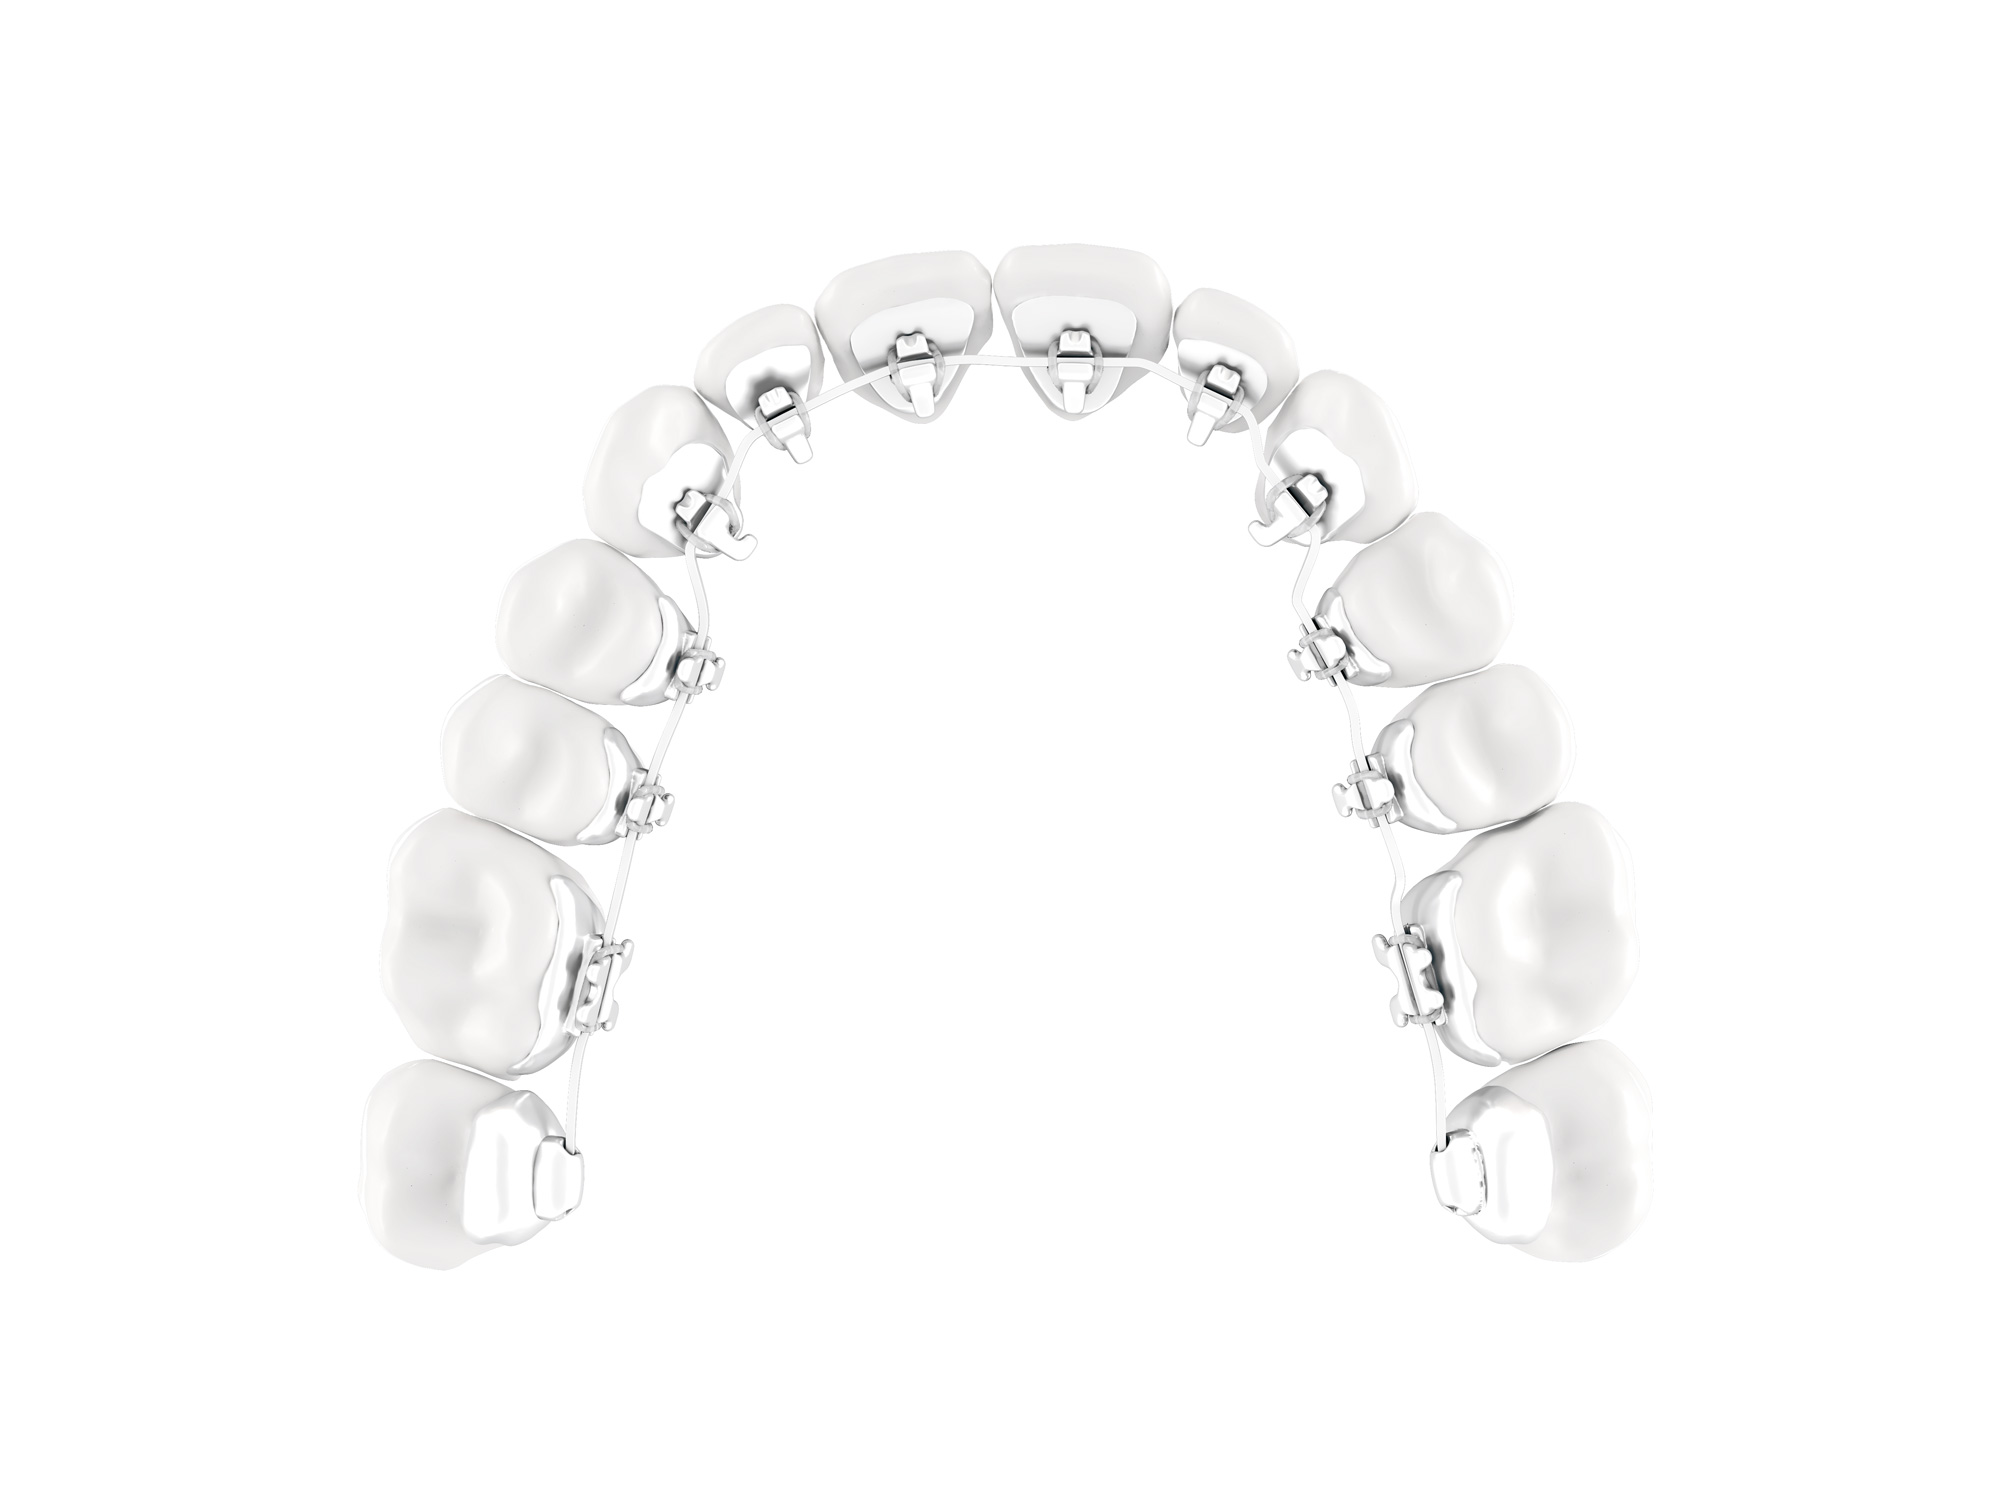 Lingual-braces-SmileDesigner-The Hague Orthdontist